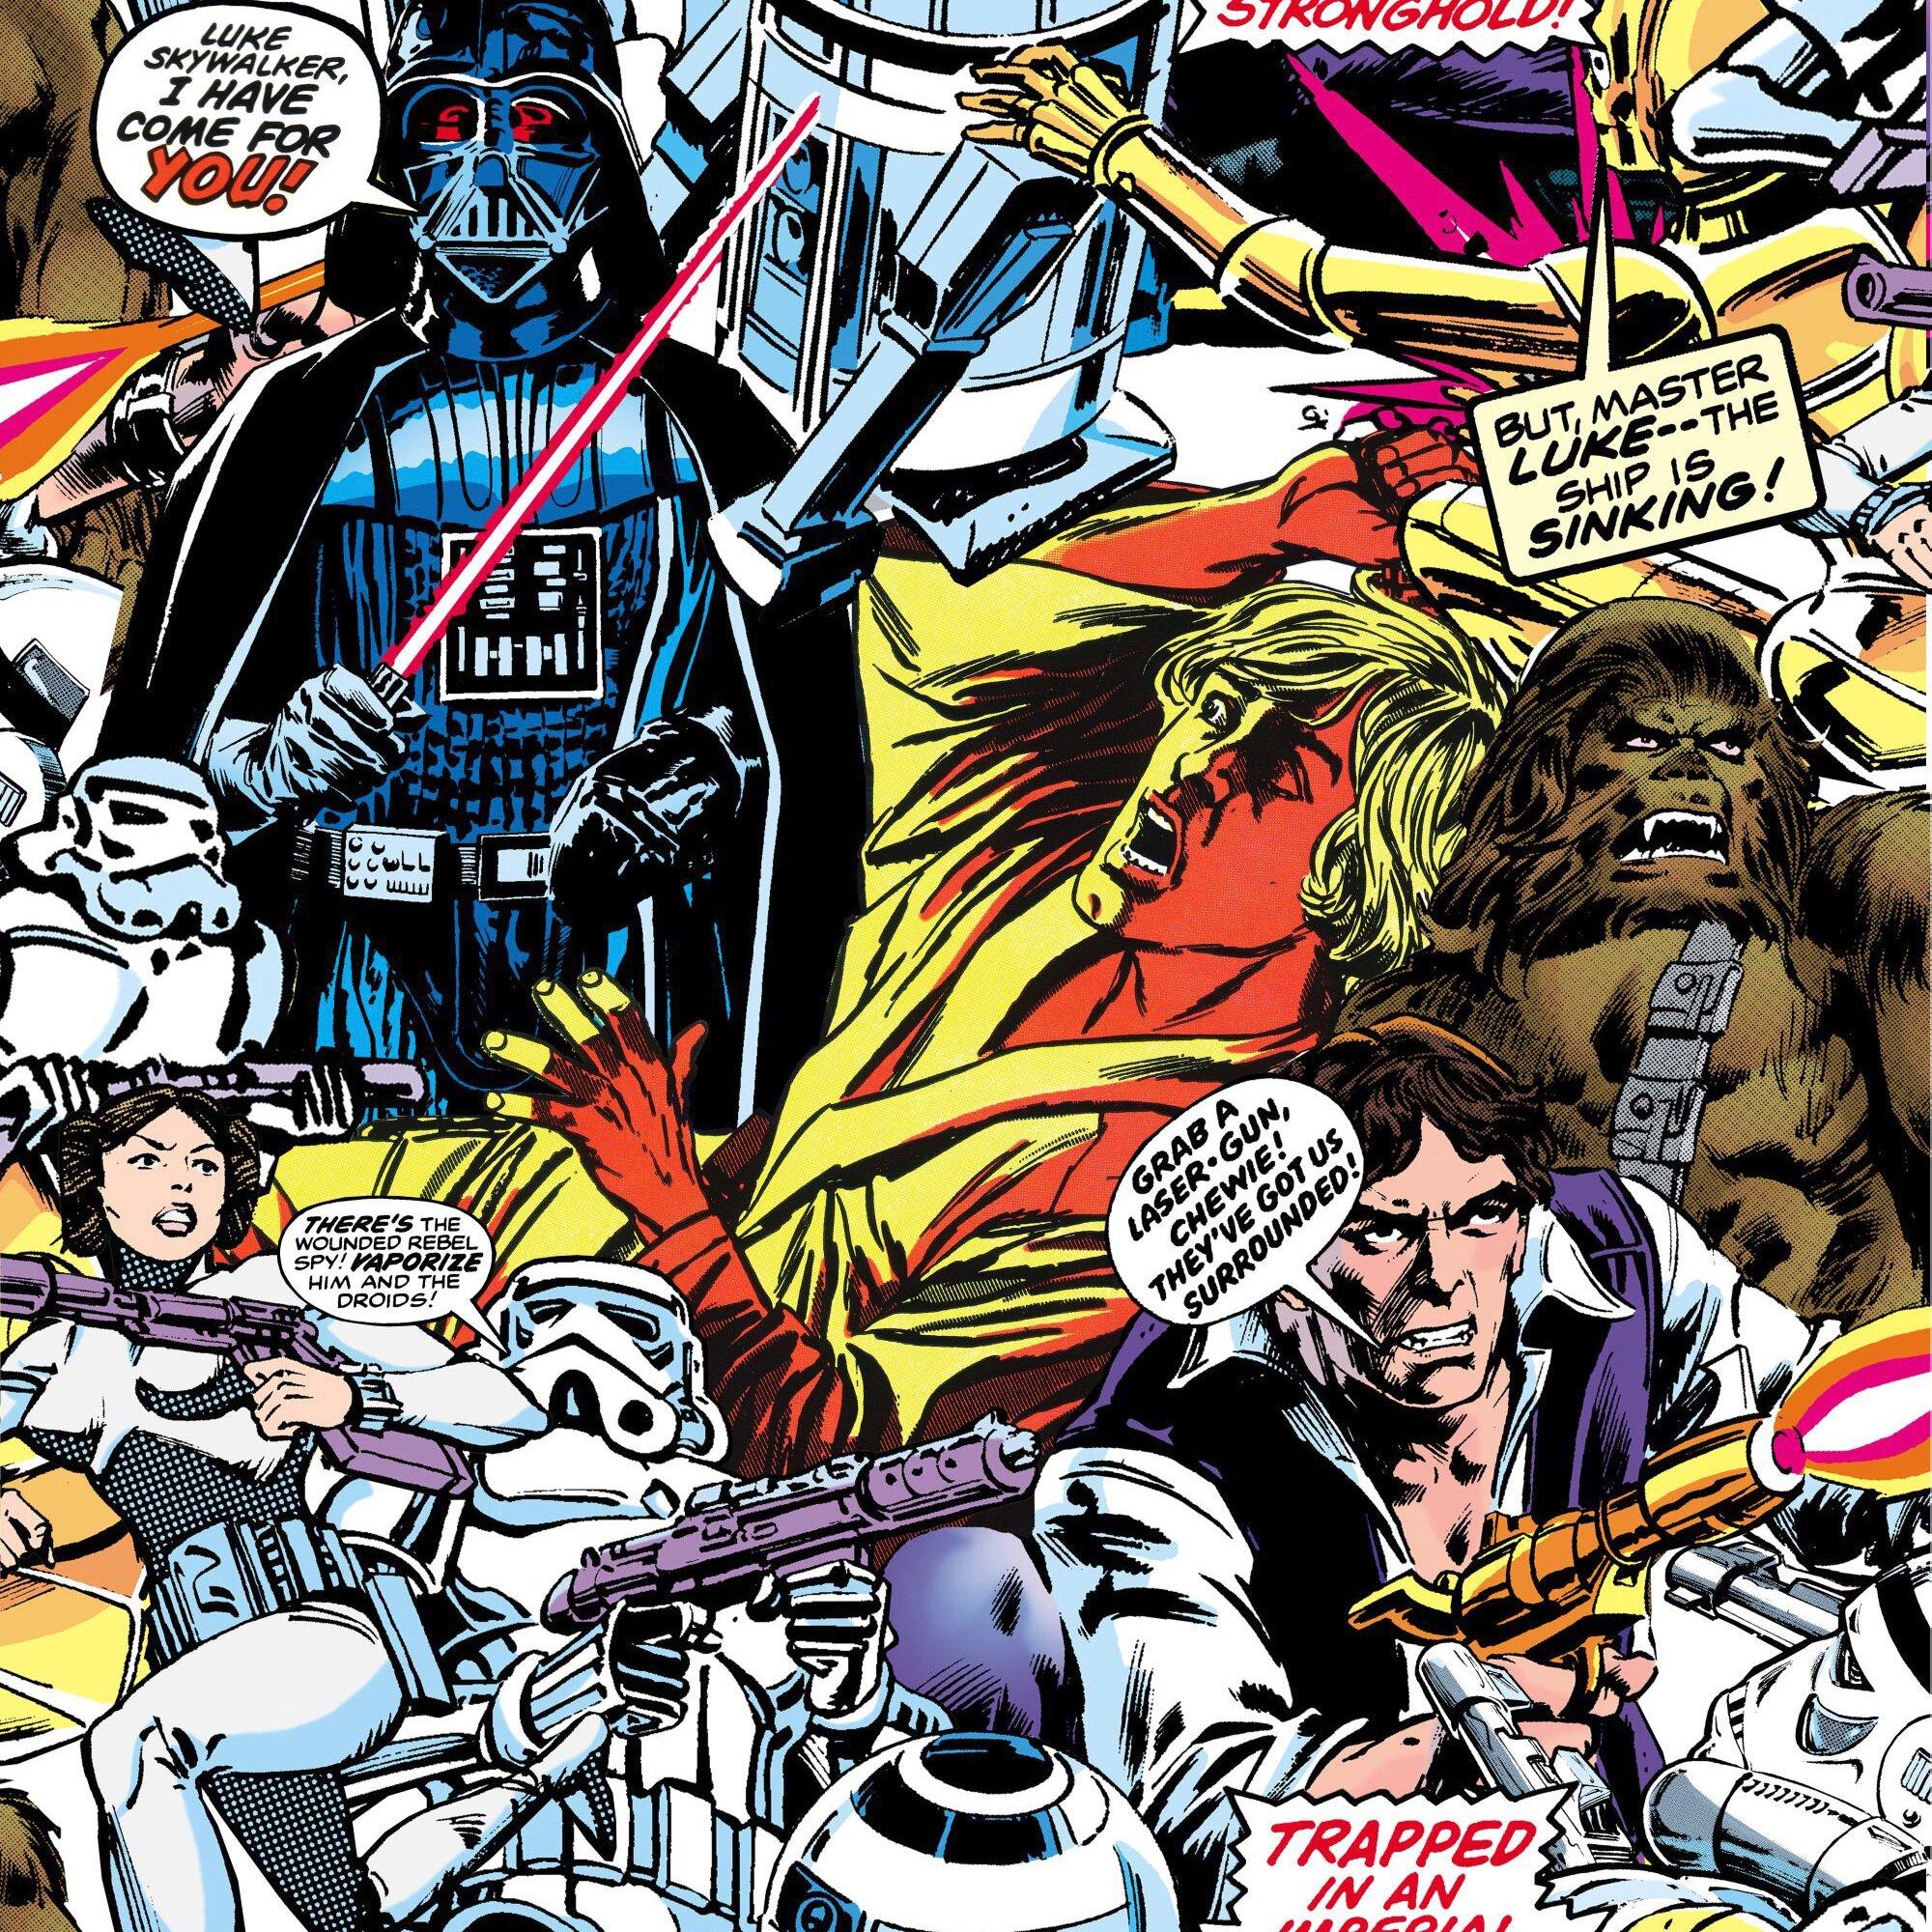 Star Wars Kinderzimmertapete Comic mehrfarbig